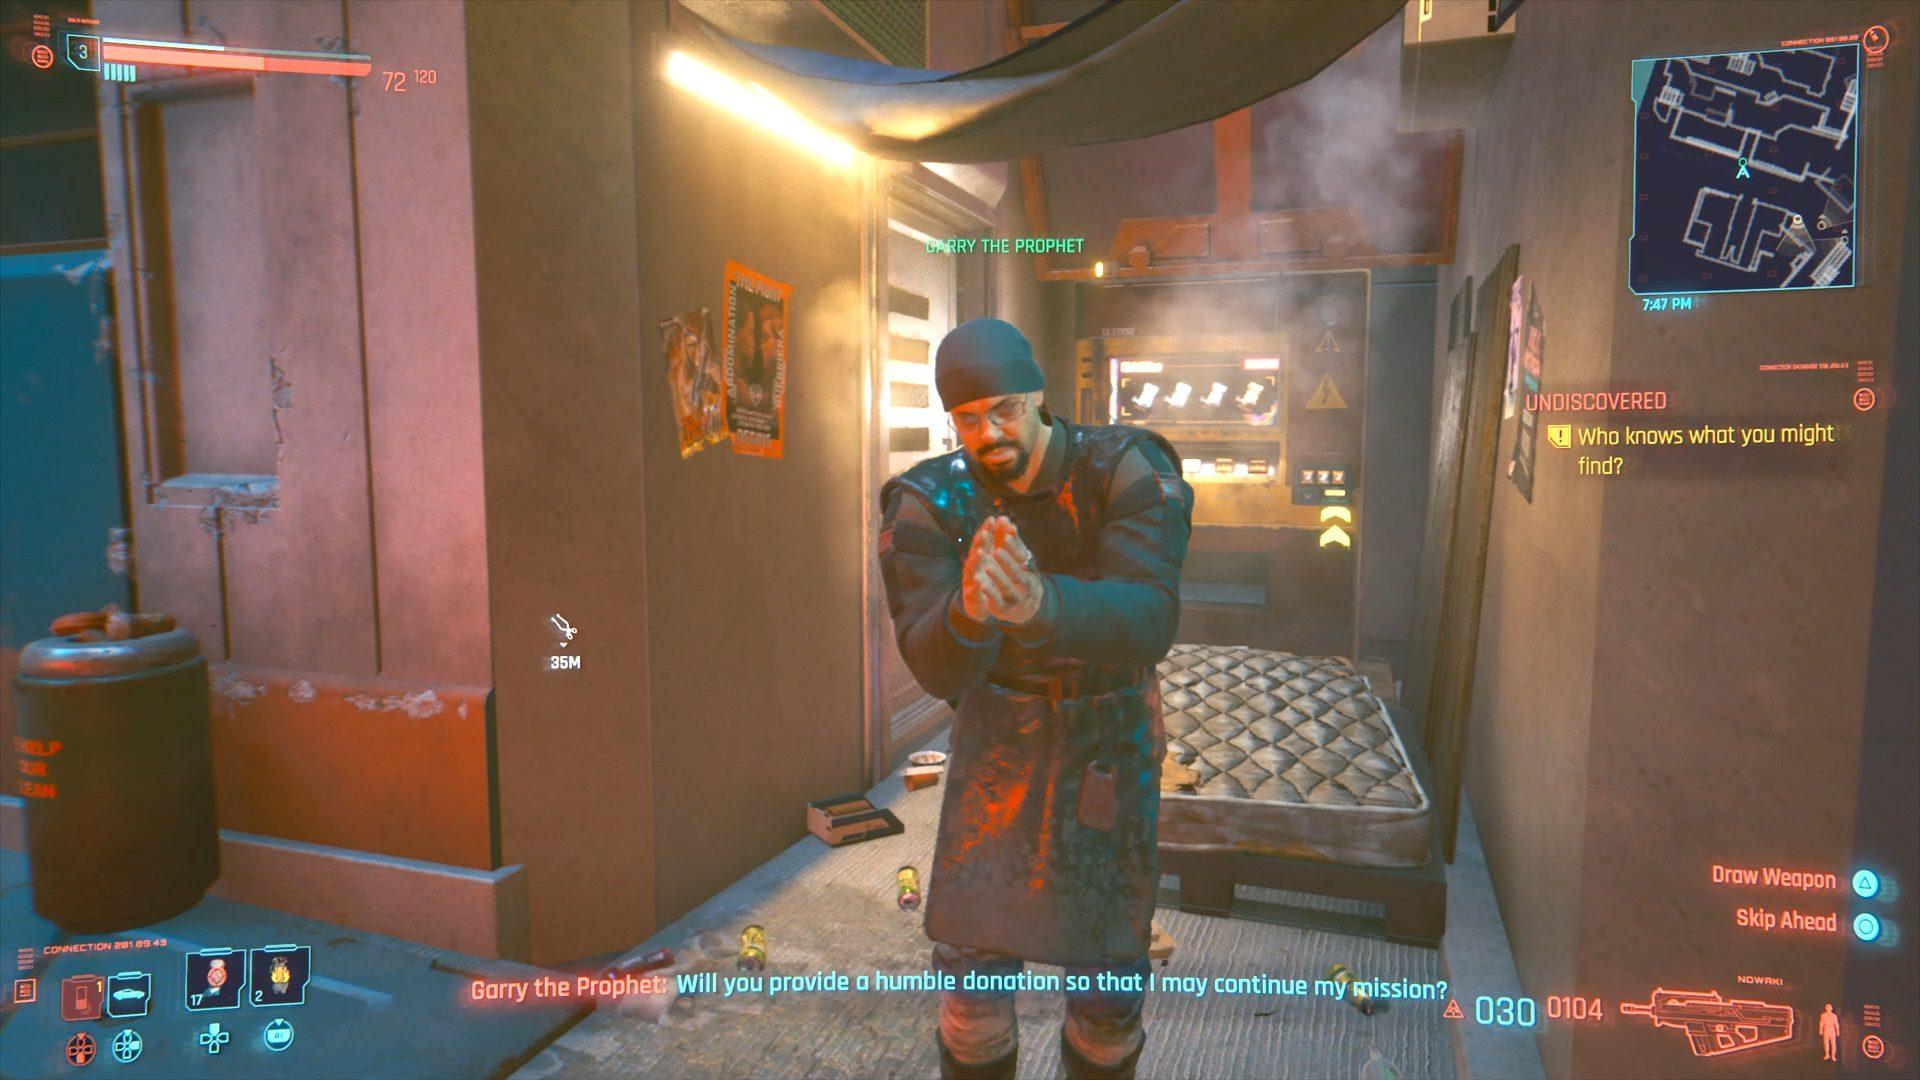 Cyberpunk 2077 Garry The Prophet CohhCarnage Location